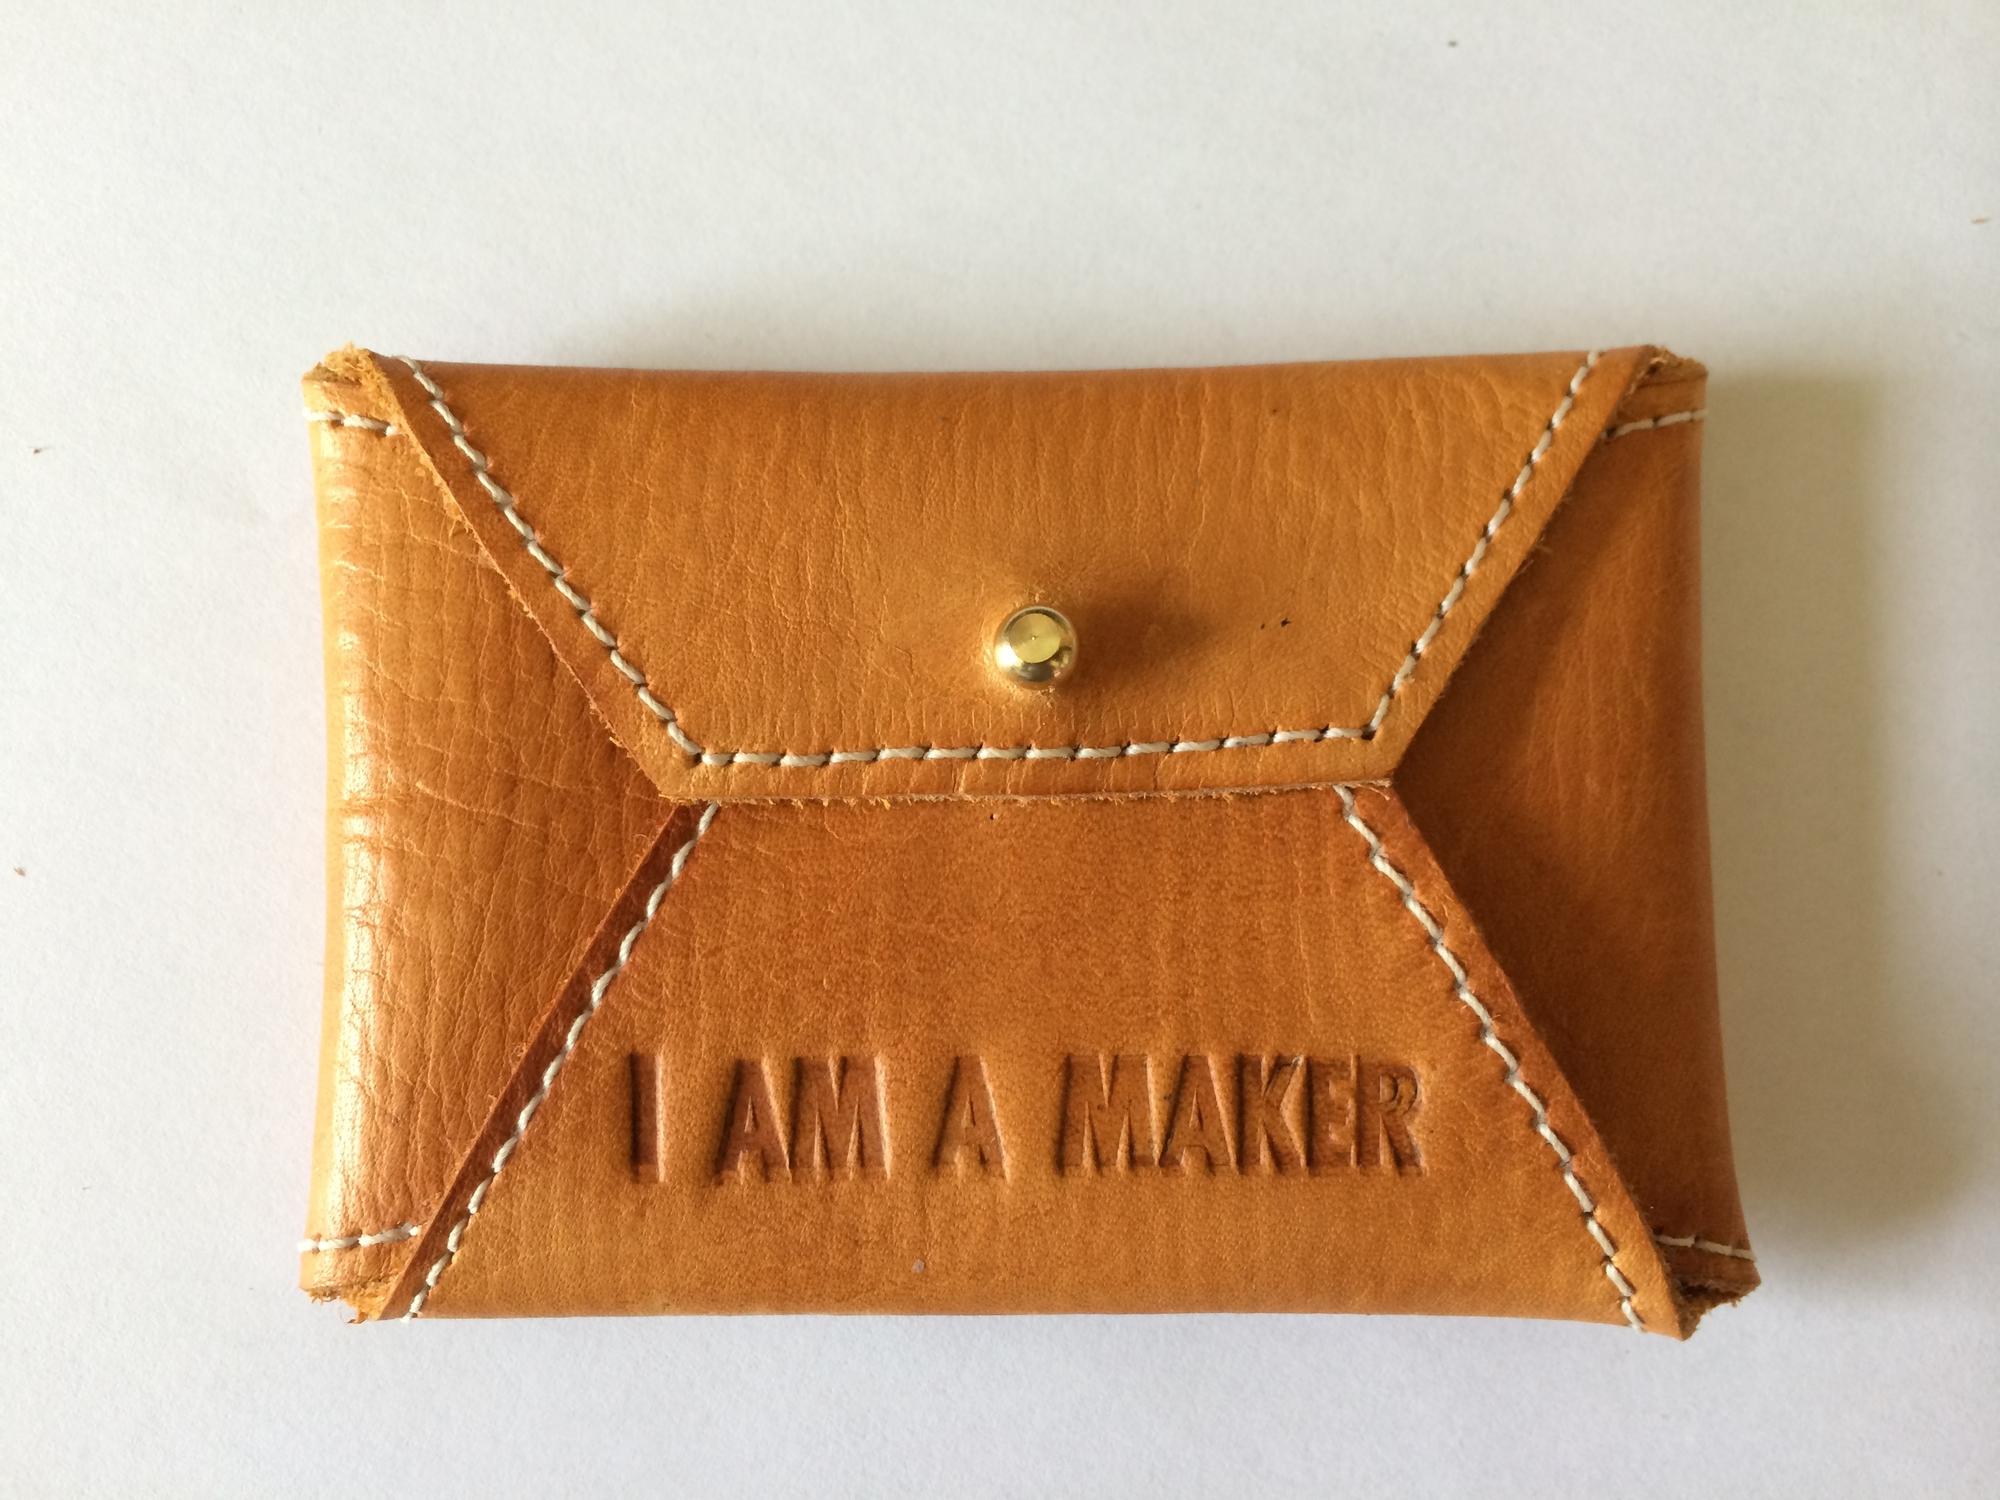 Leather business card wallet  ©FizzArrow